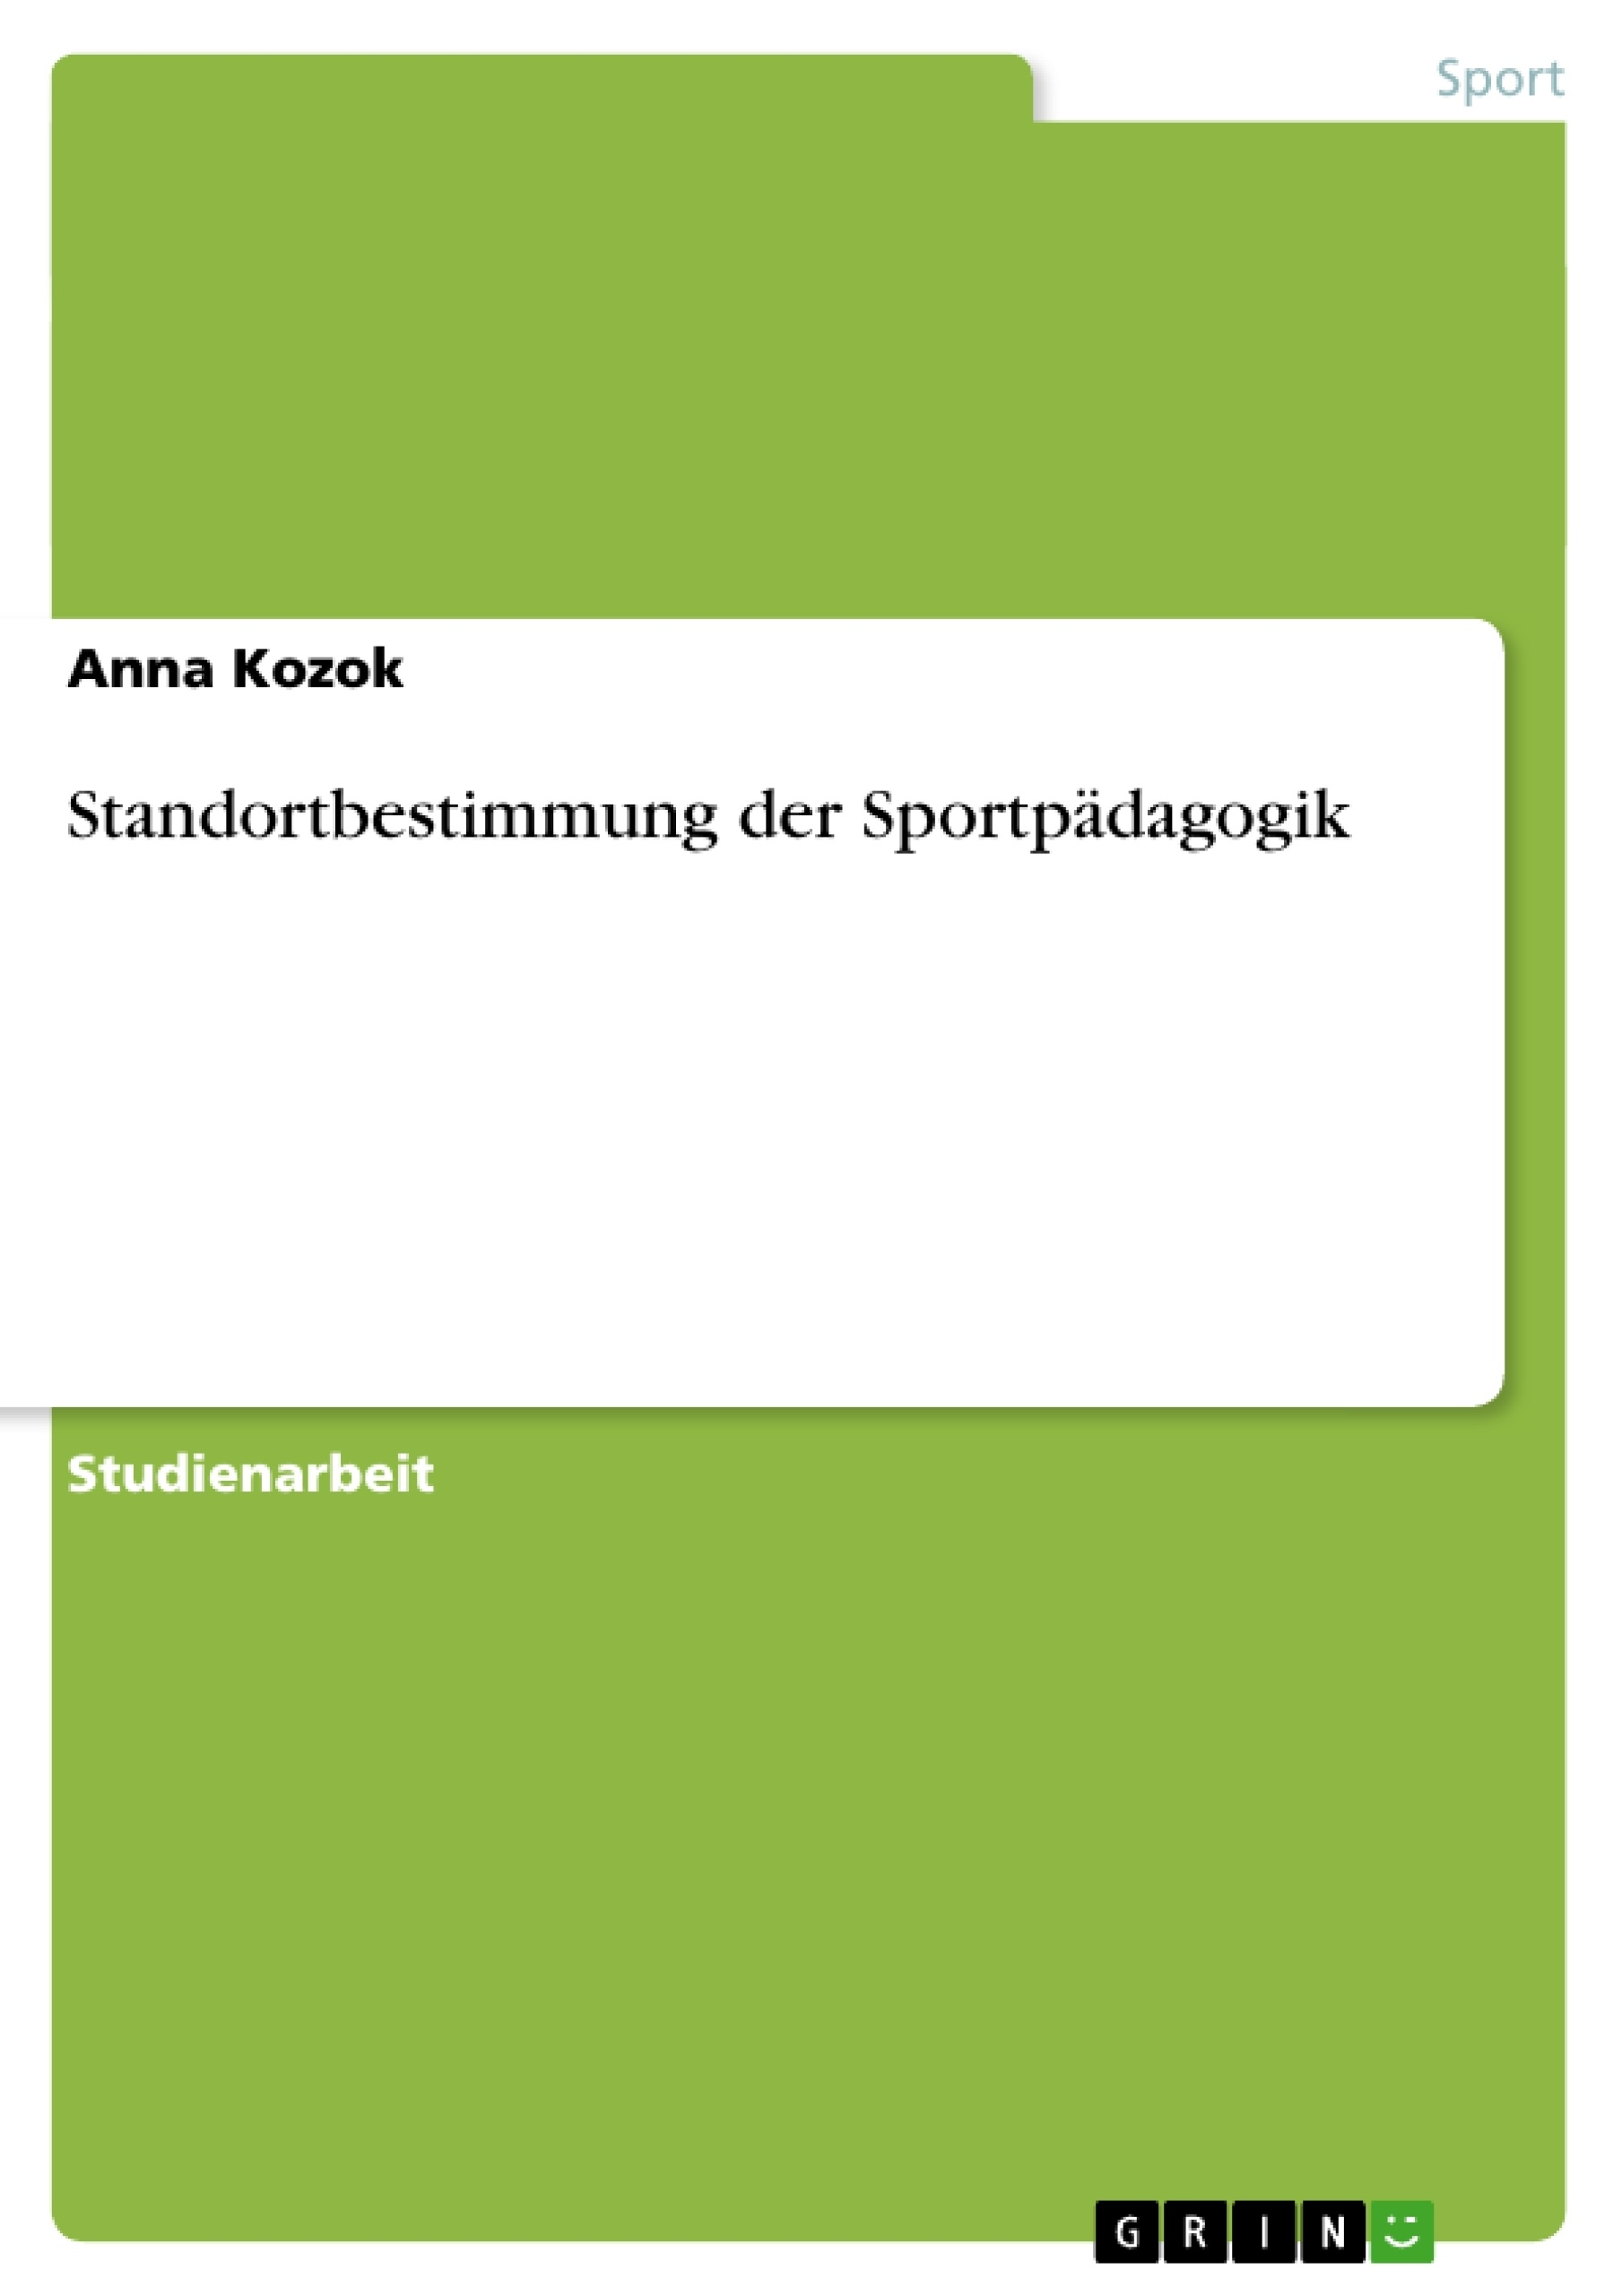 Titel: Standortbestimmung der Sportpädagogik